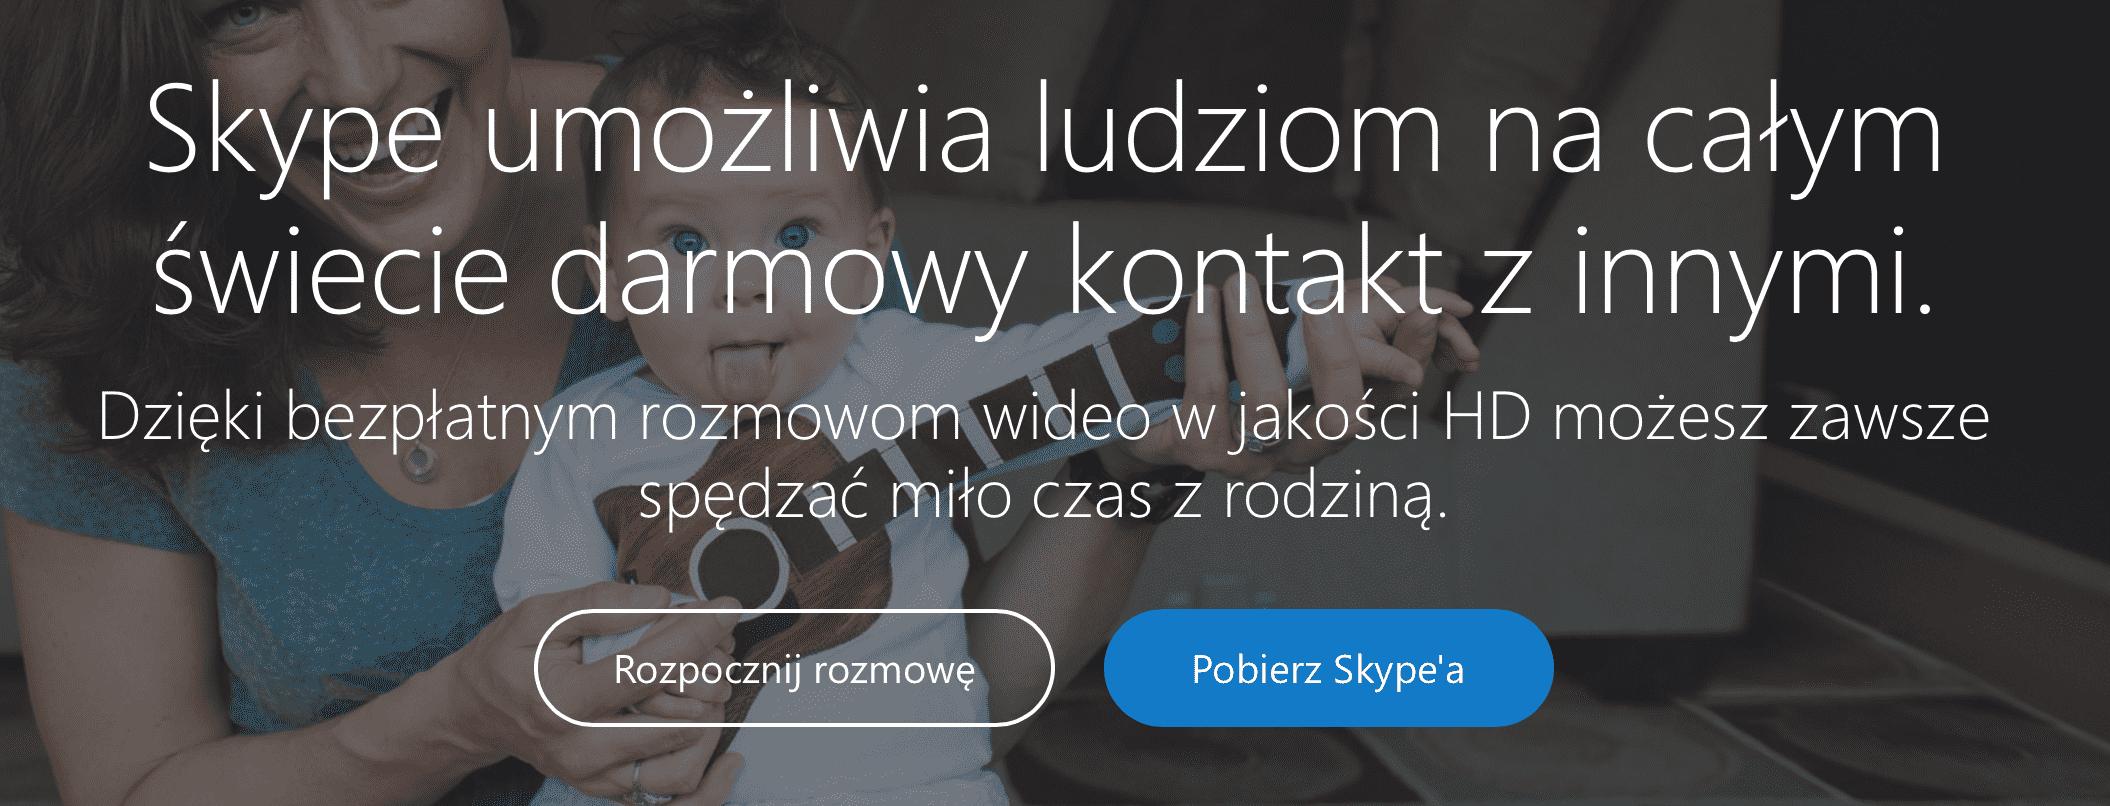 zrzut-ekranu-2016-11-15-o-19-52-00